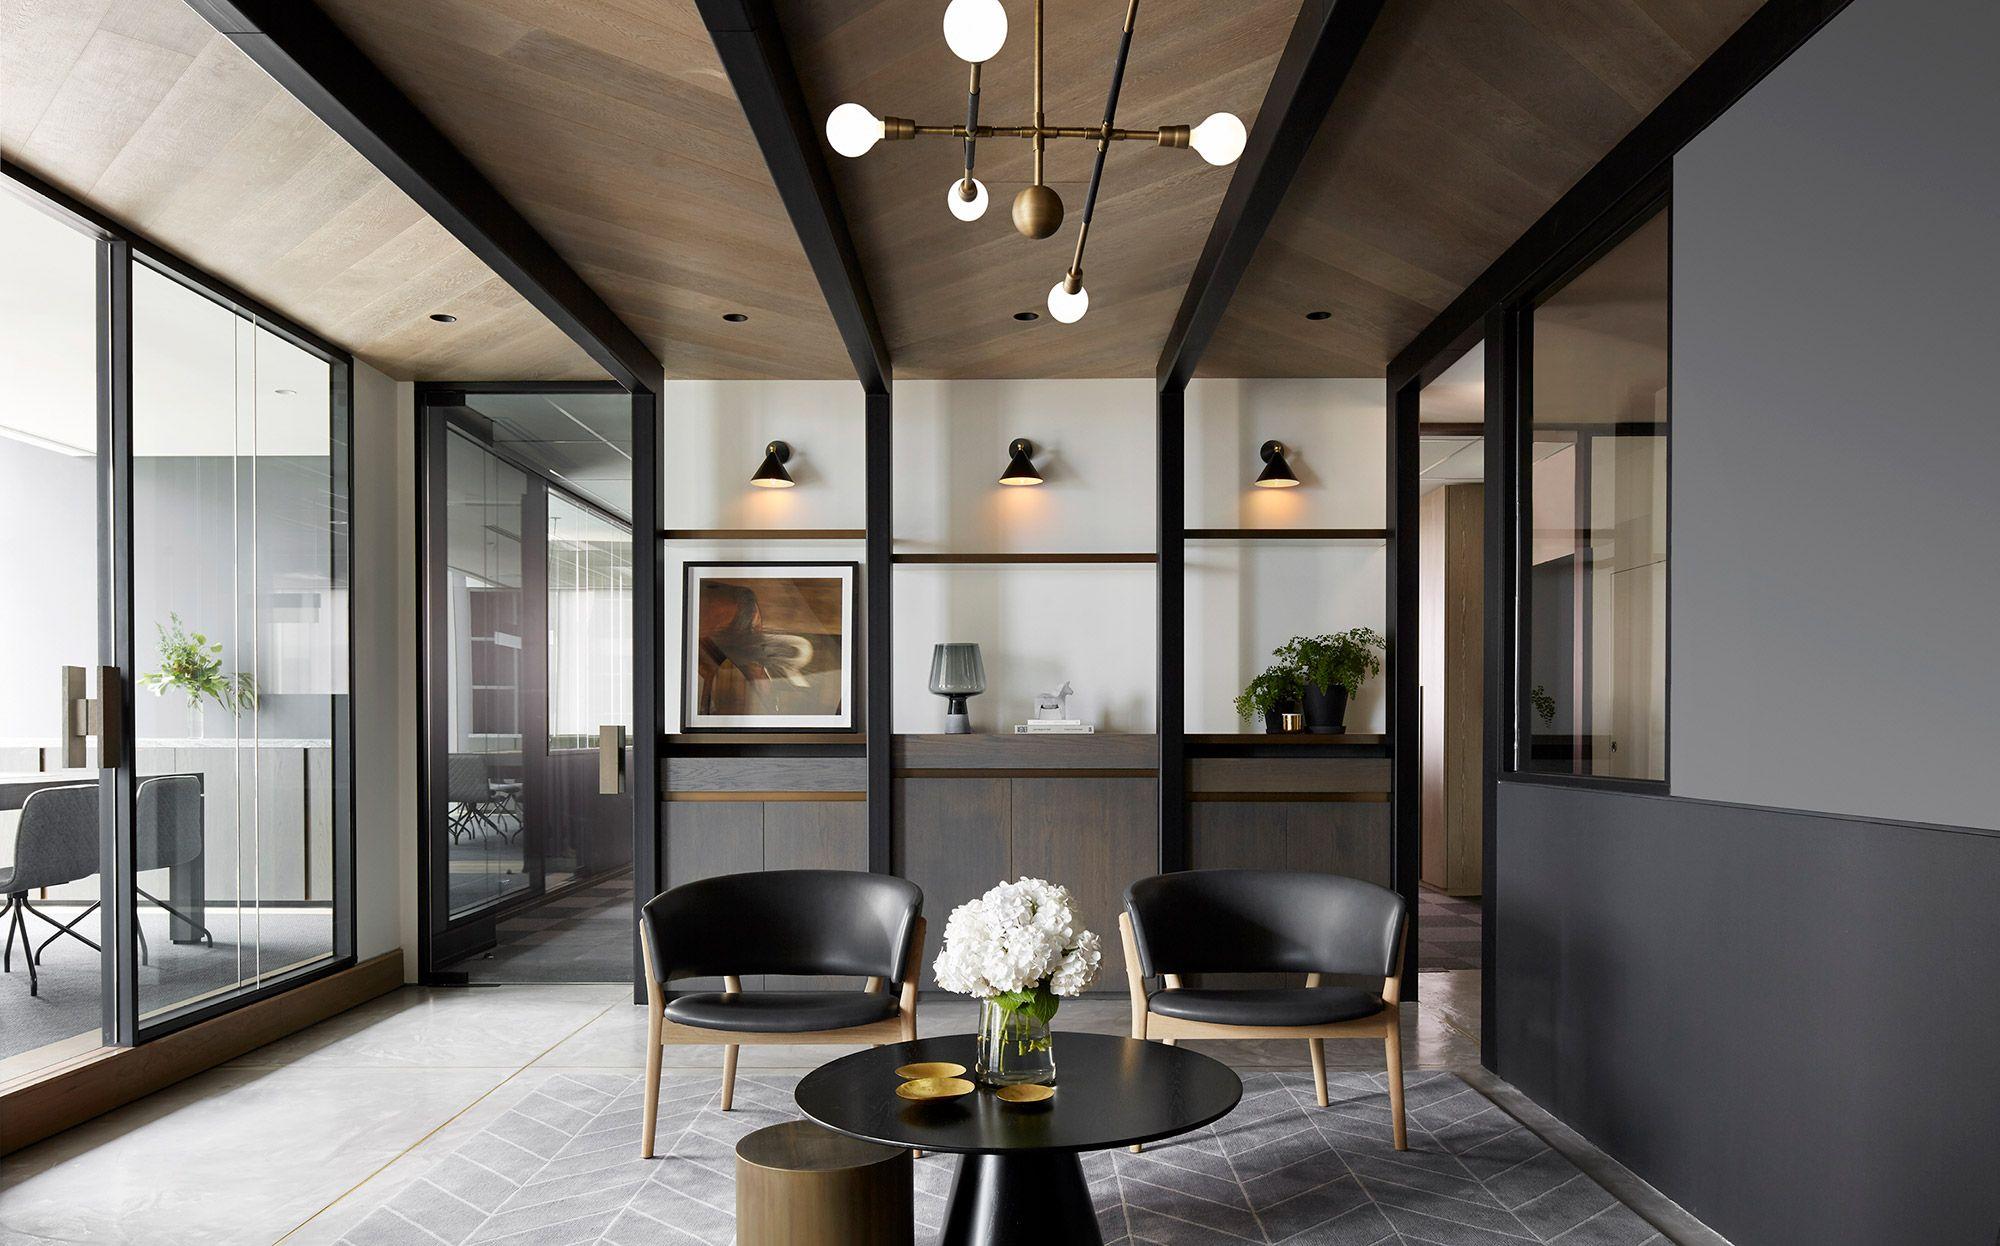 image result for mim design office 35 m m 2 mim design rh pinterest com au